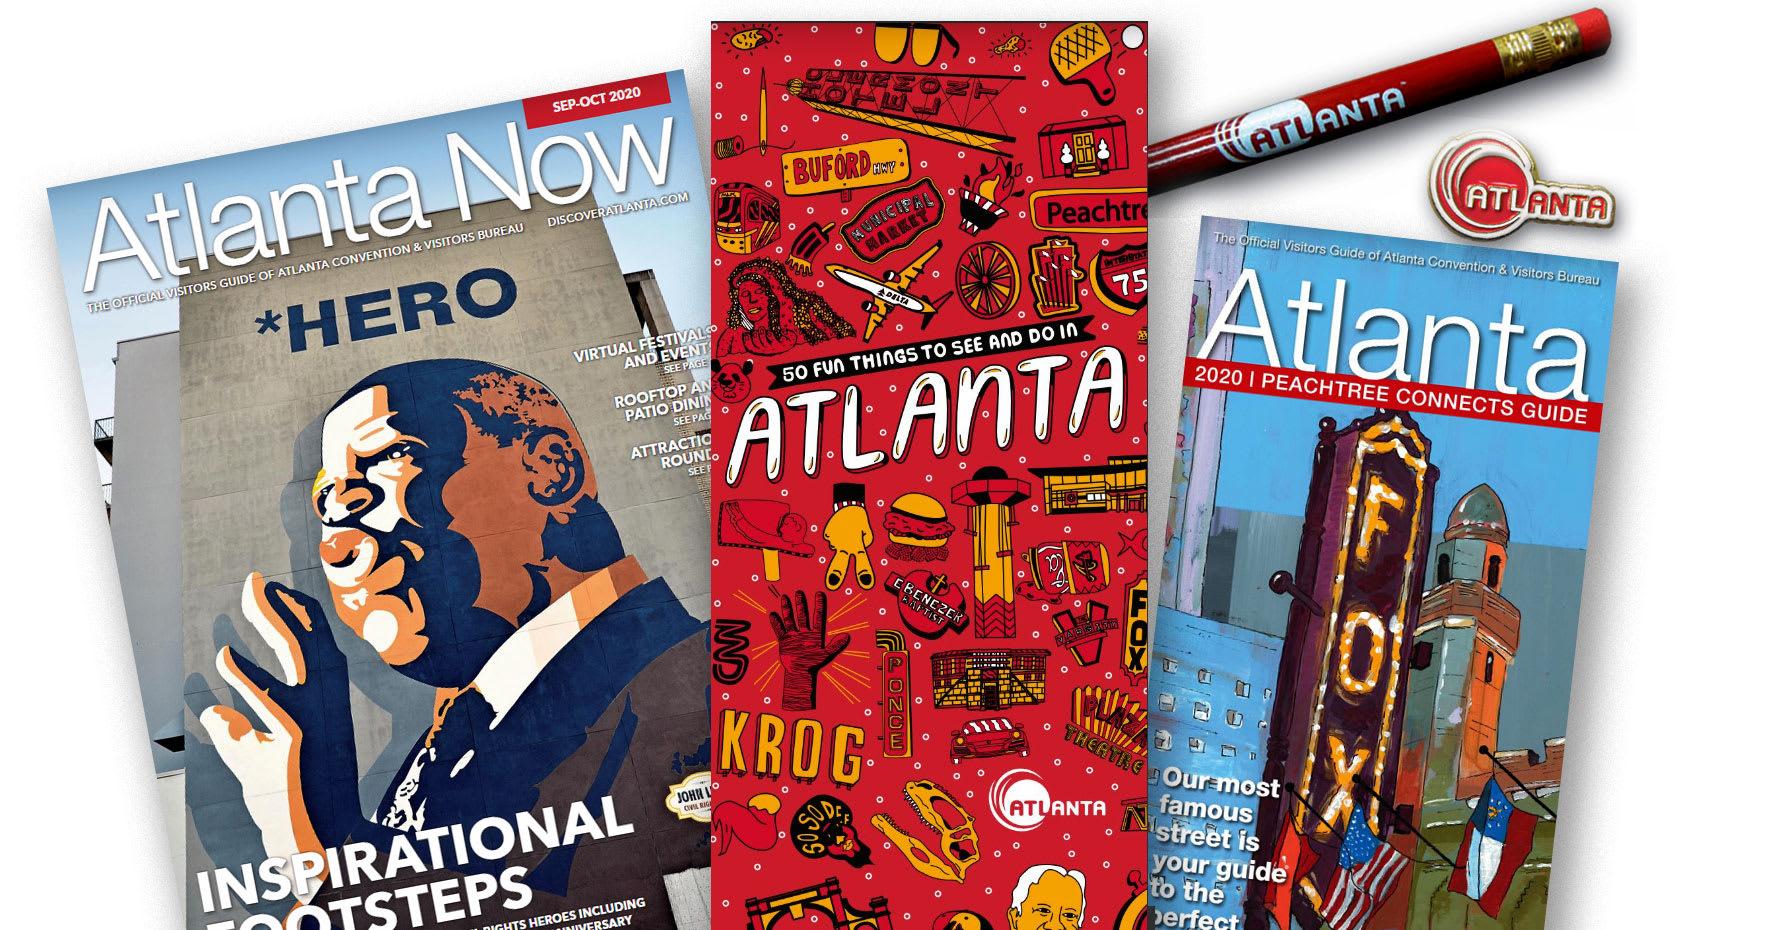 Atlanta Promotional Materials 2020